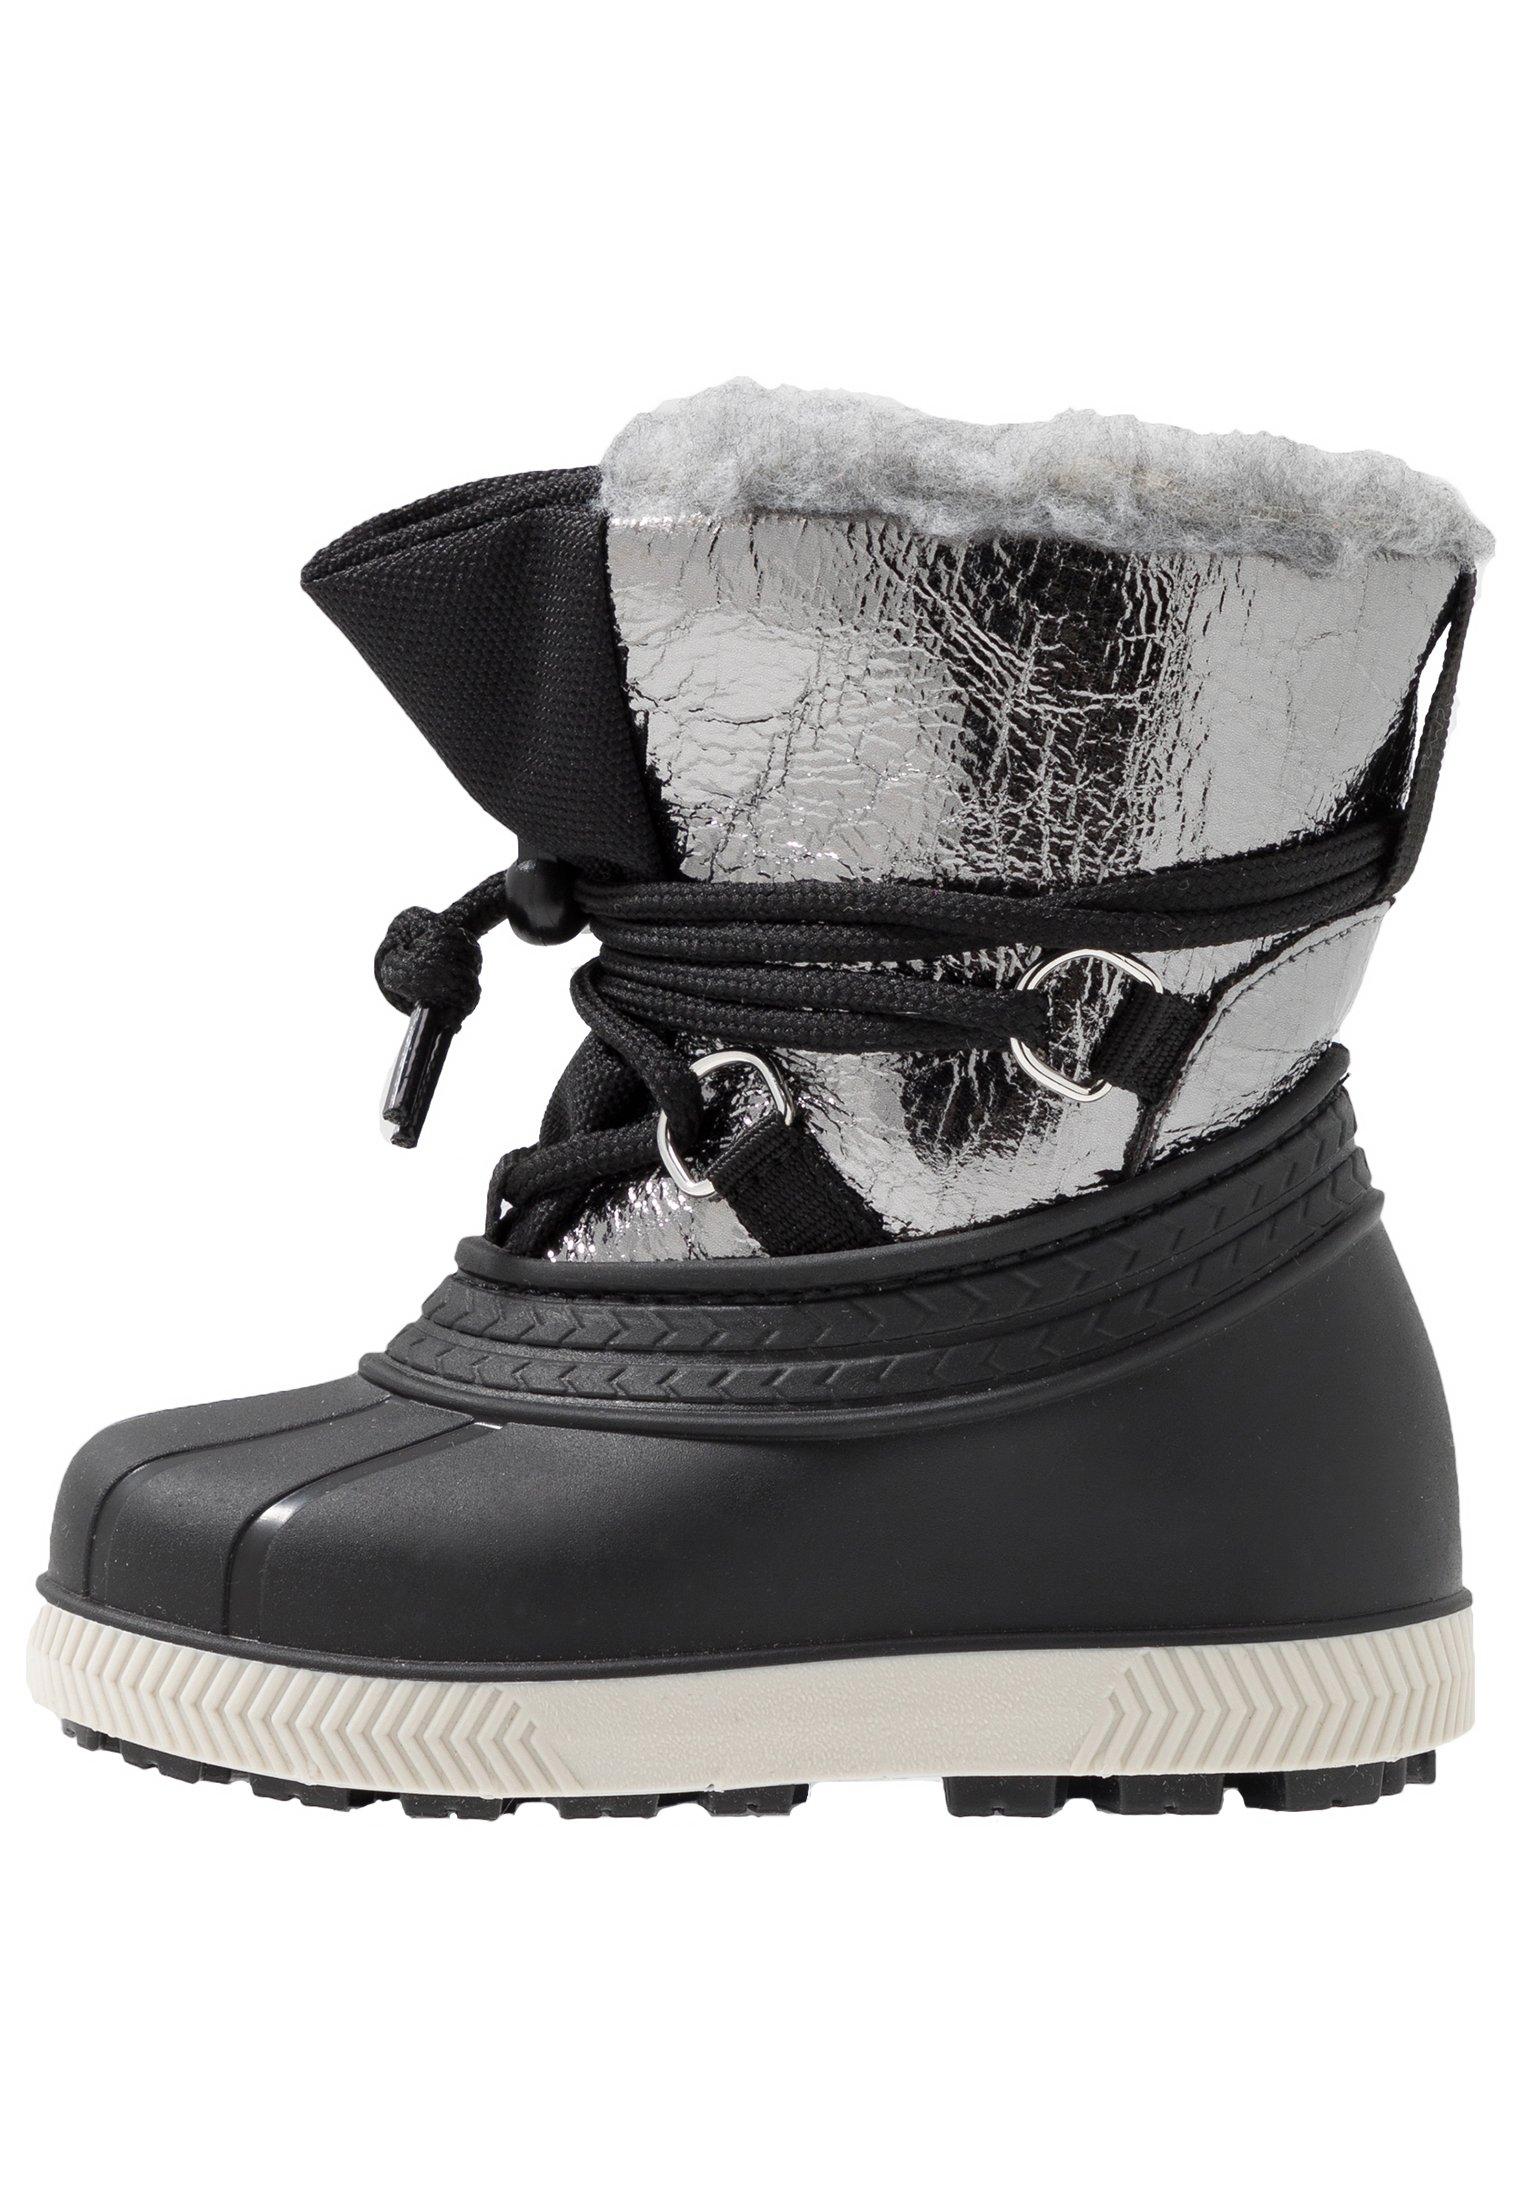 Snowboot/Winterstiefel - silver/black